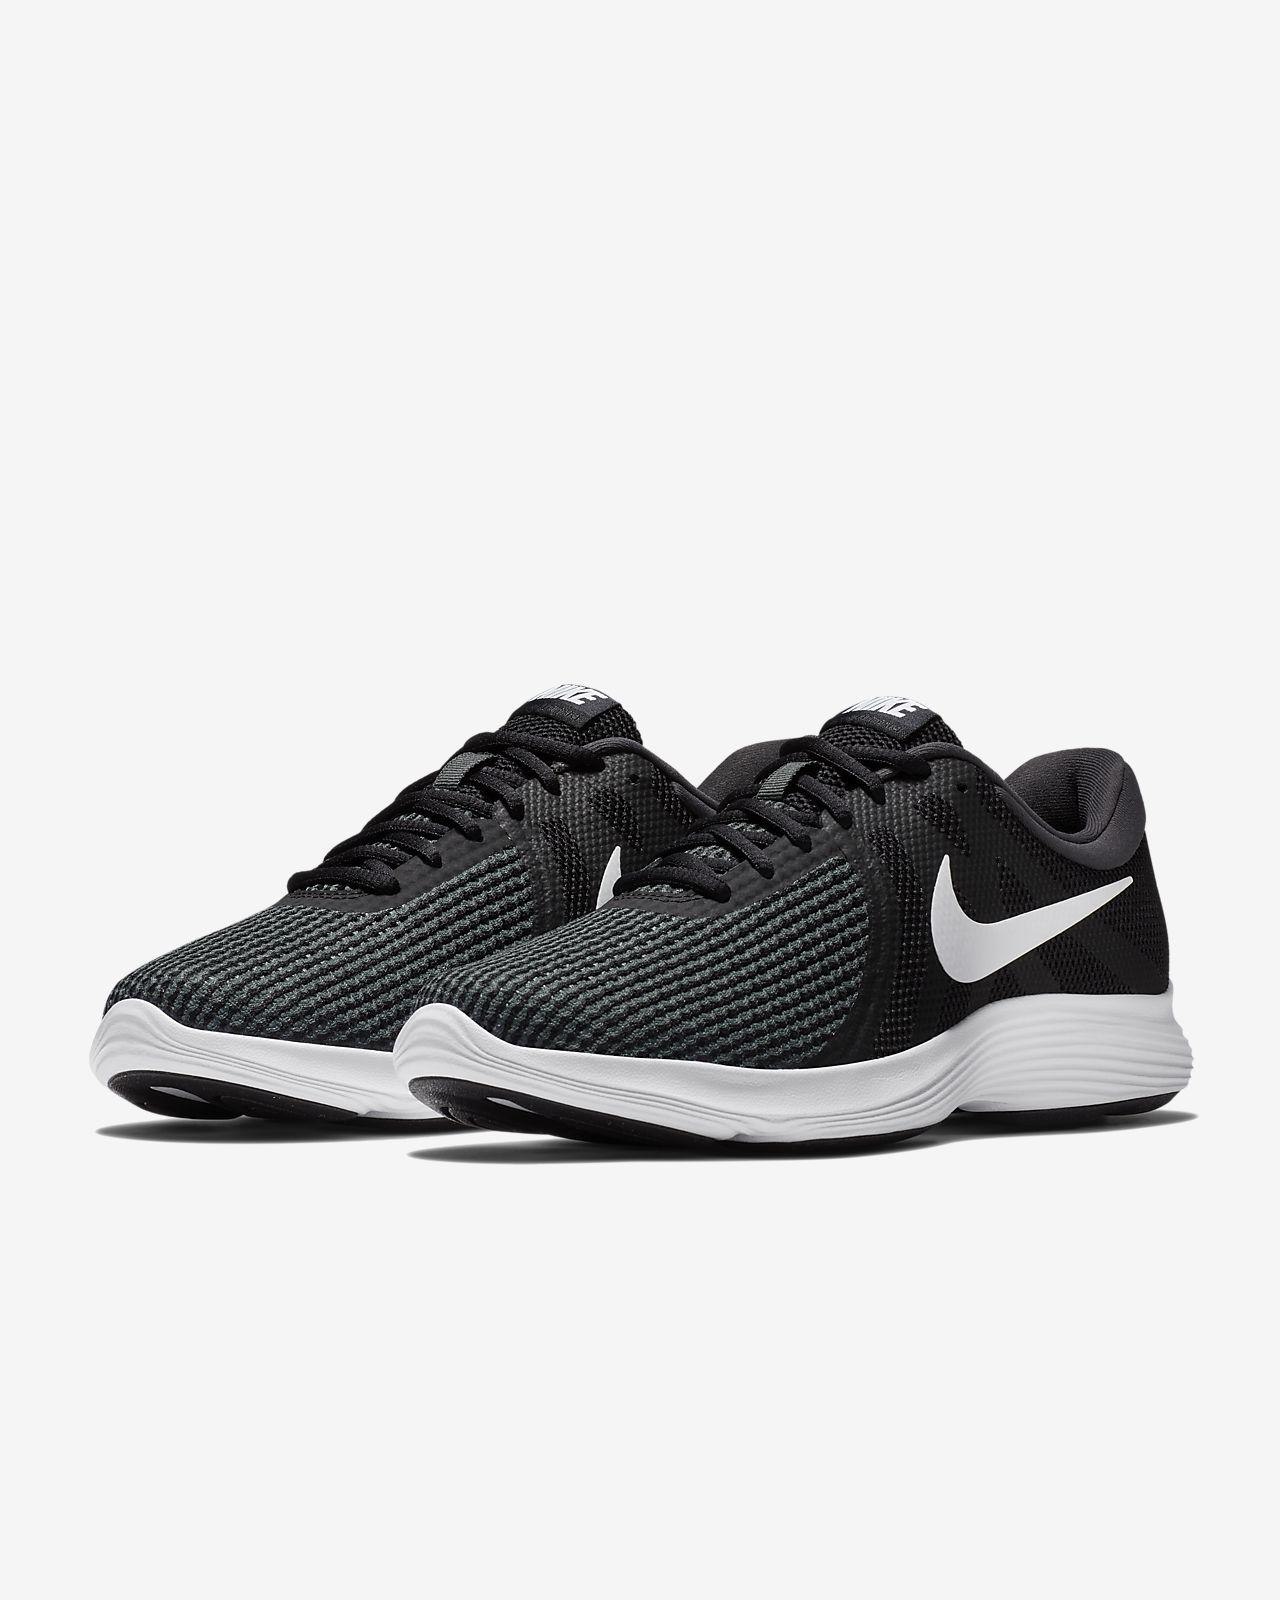 huge discount 8b799 10a45 ... Scarpa da running (EU) Nike Revolution 4 - Uomo